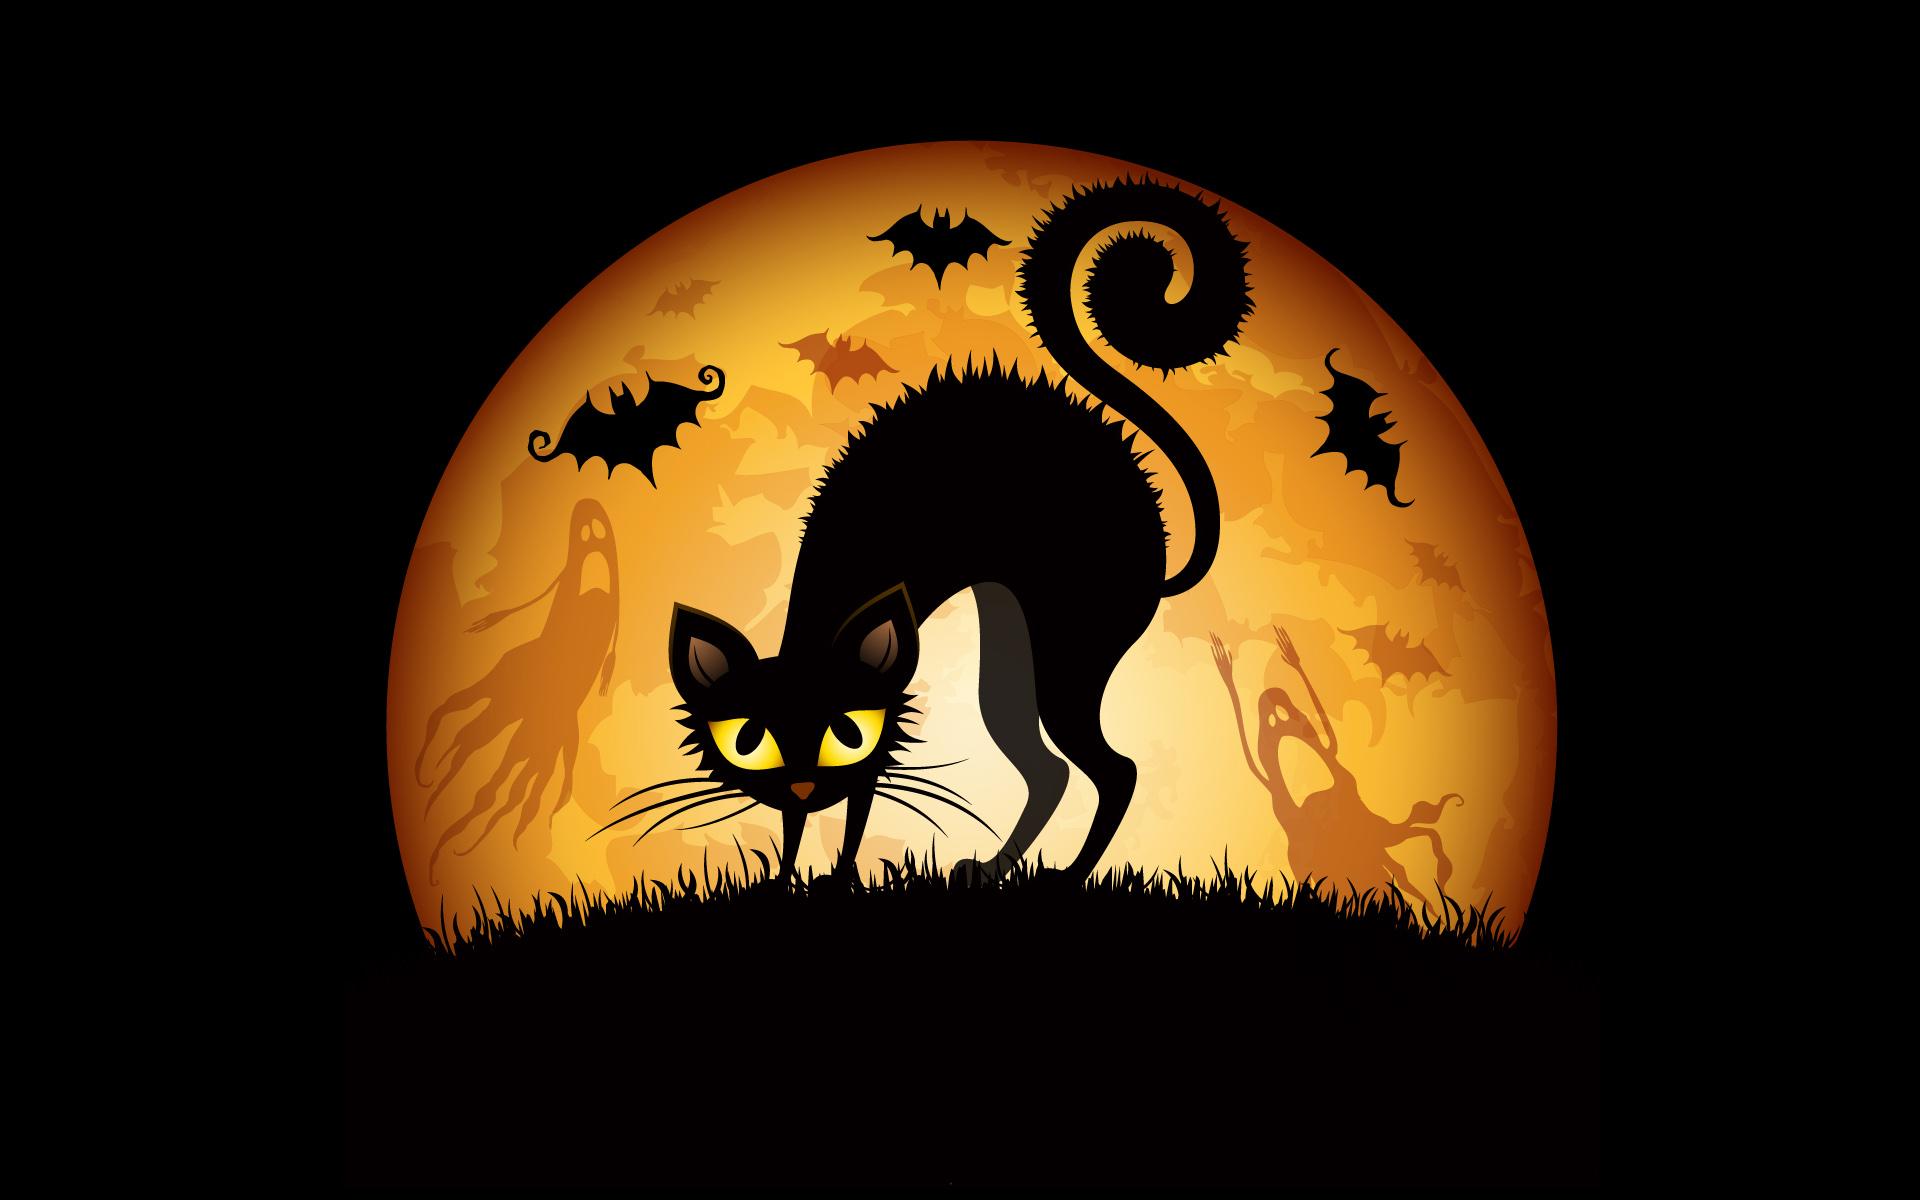 pre_1508963637__halloween-cat-63742048.jpg